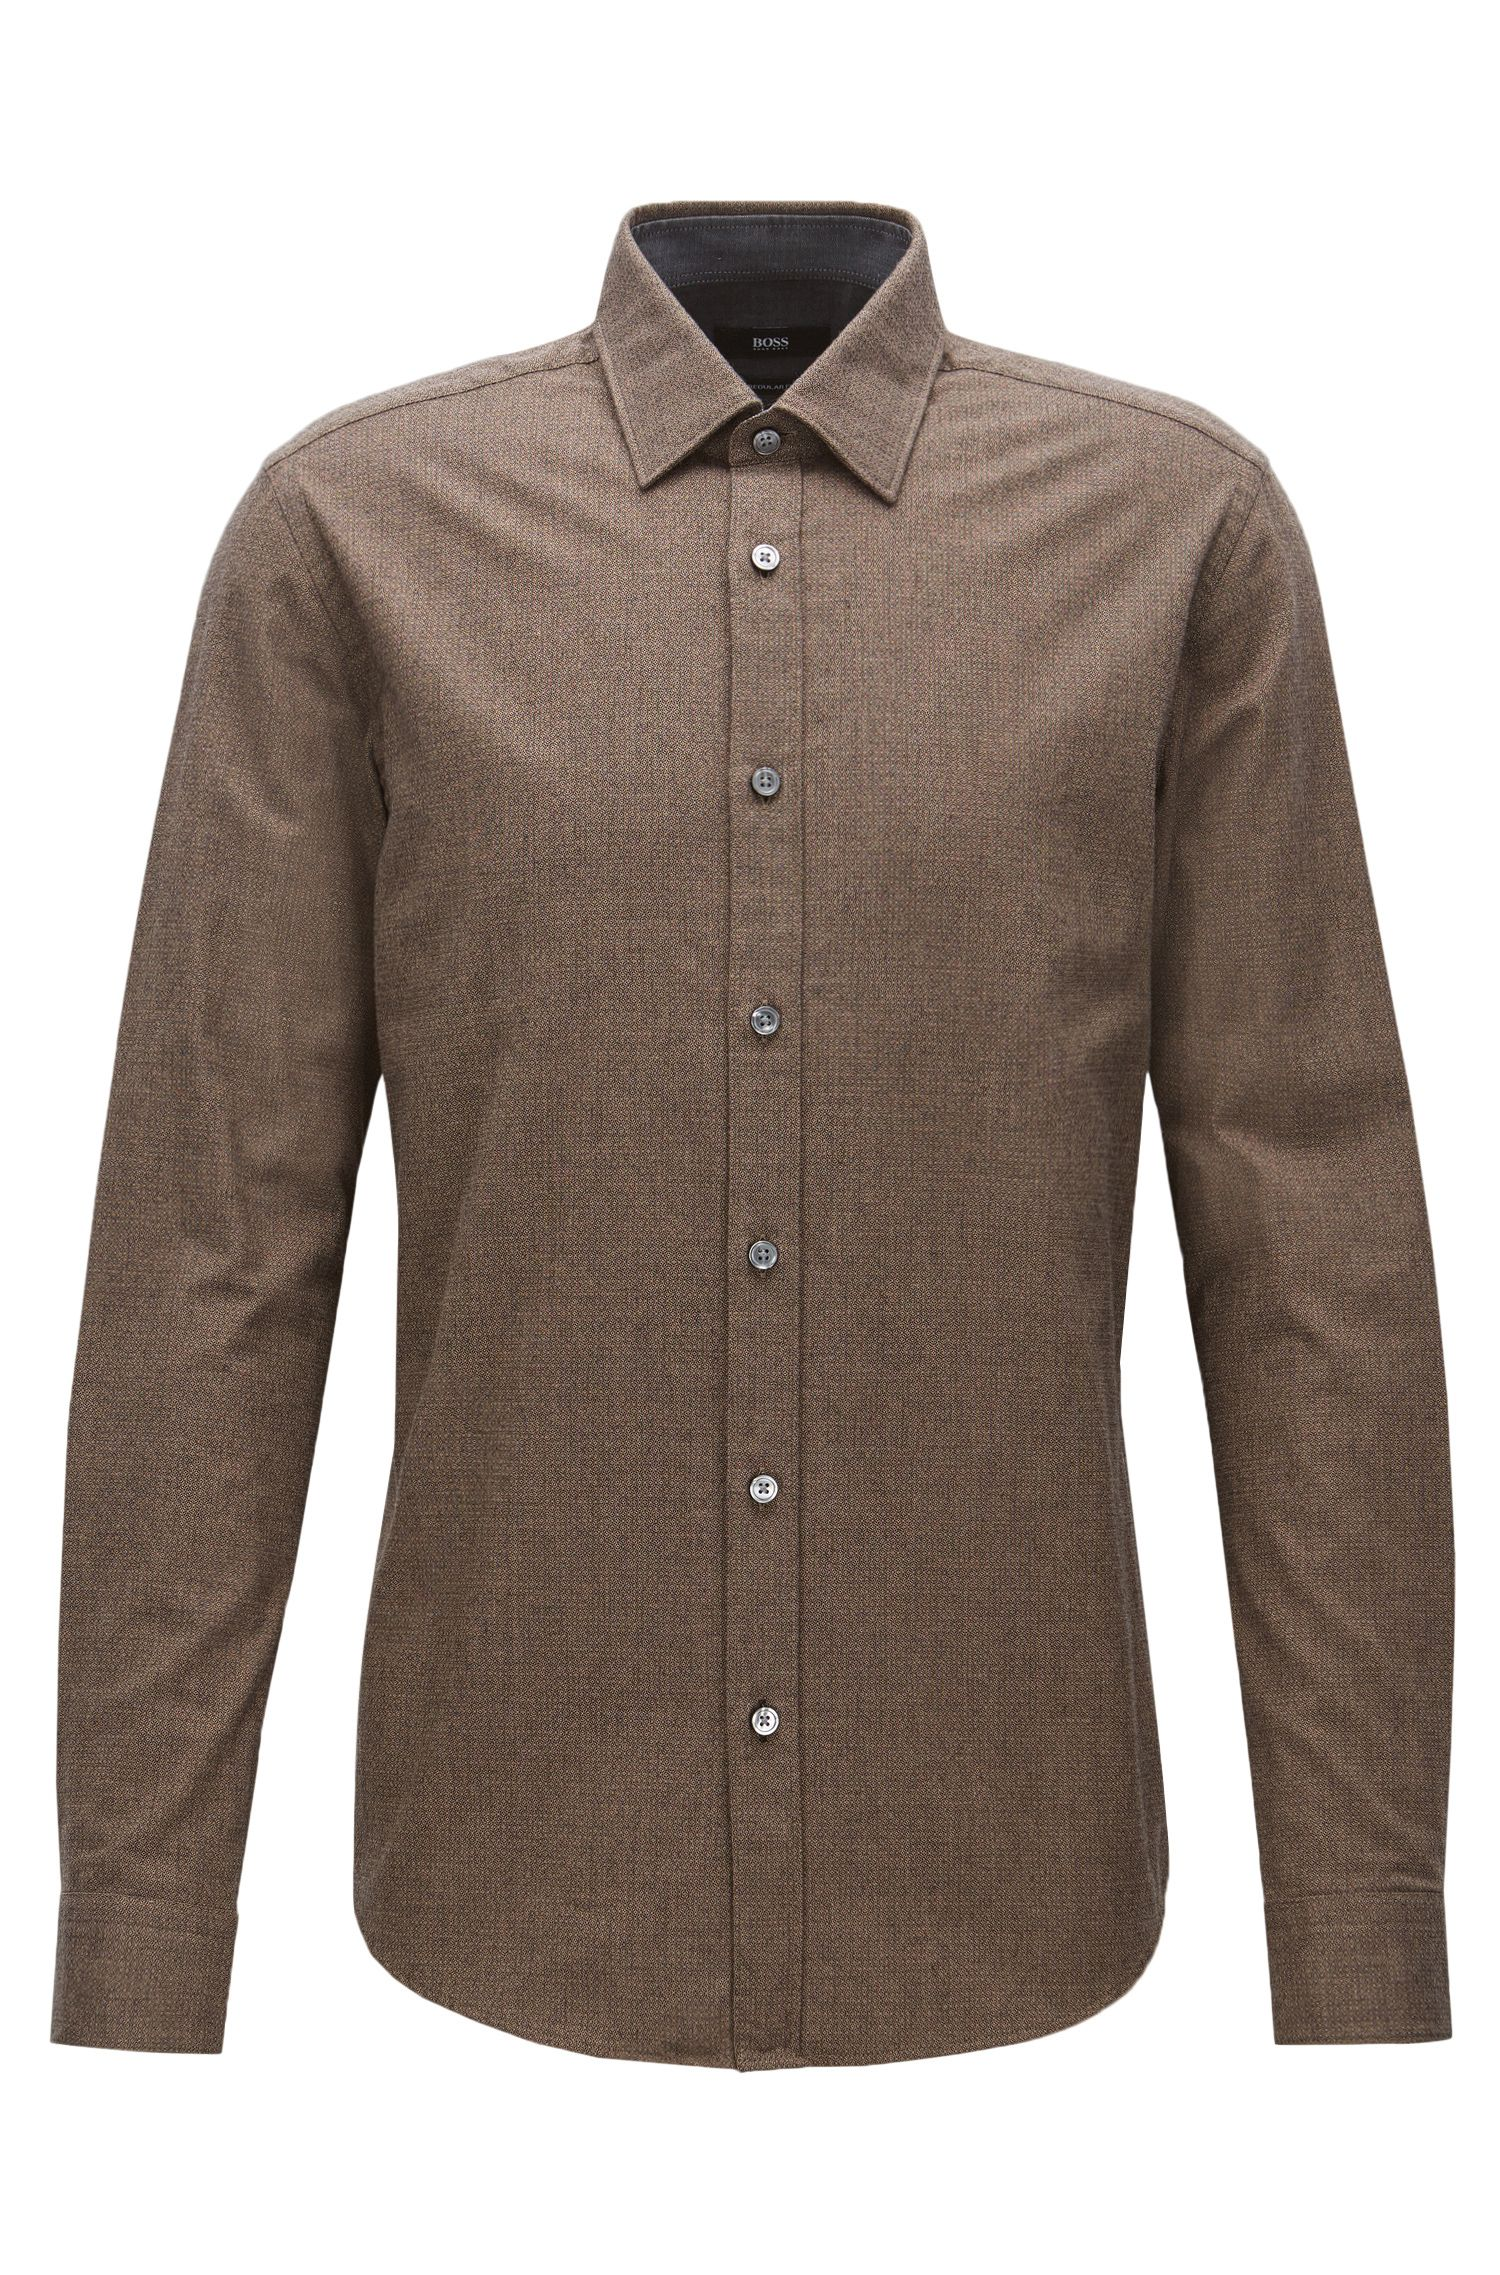 'Lukas' | Regular Fit, Micro-Pattern Cotton Flannel Button Down Shirt